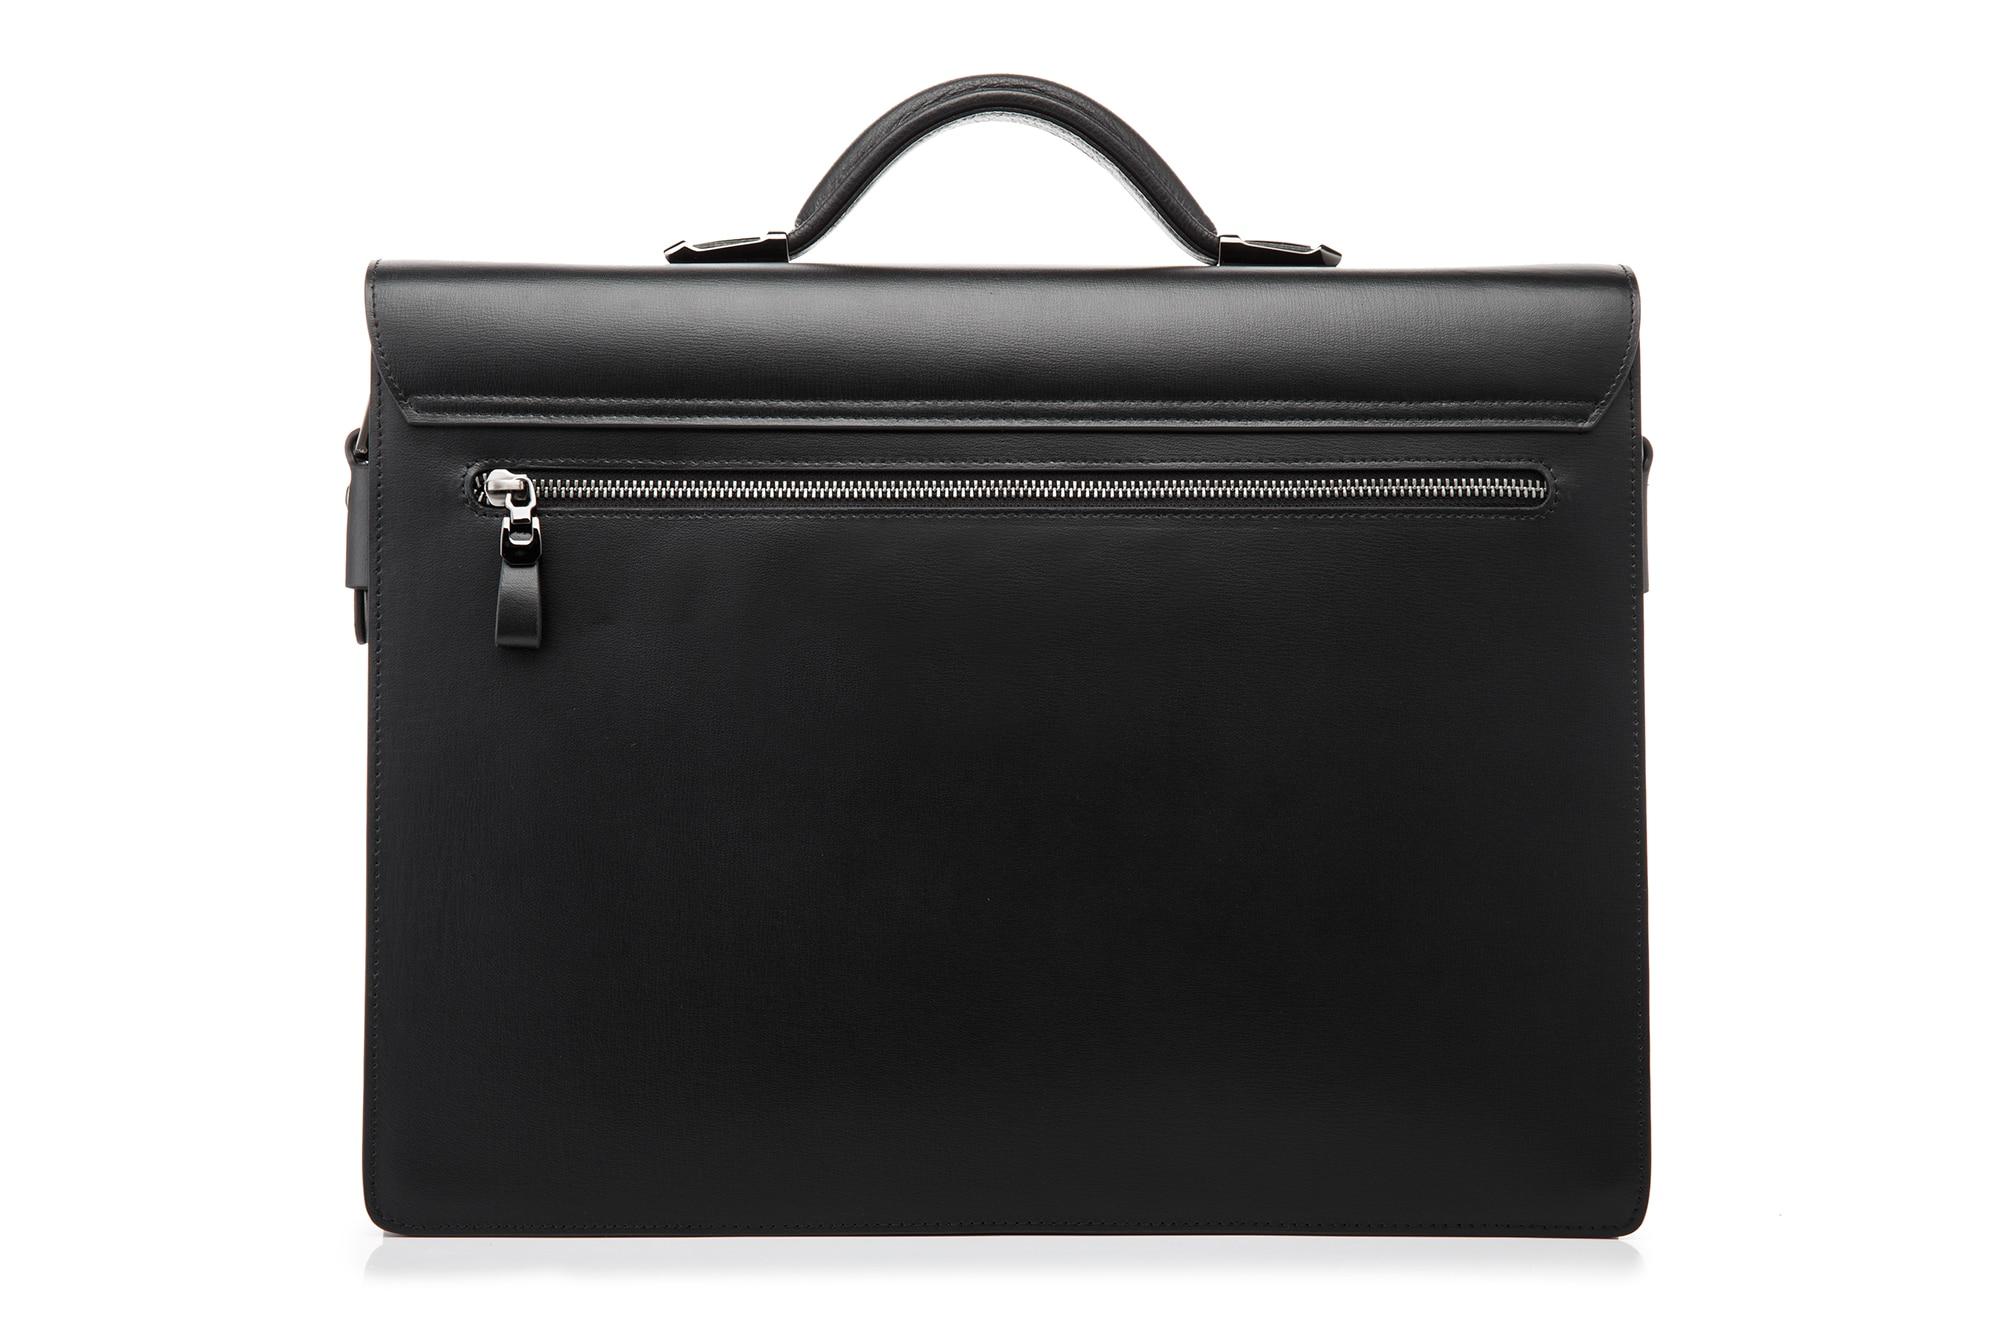 YINTE kožna crna torba muška aktovka velika i deblja torba torbica - Aktovke - Foto 3